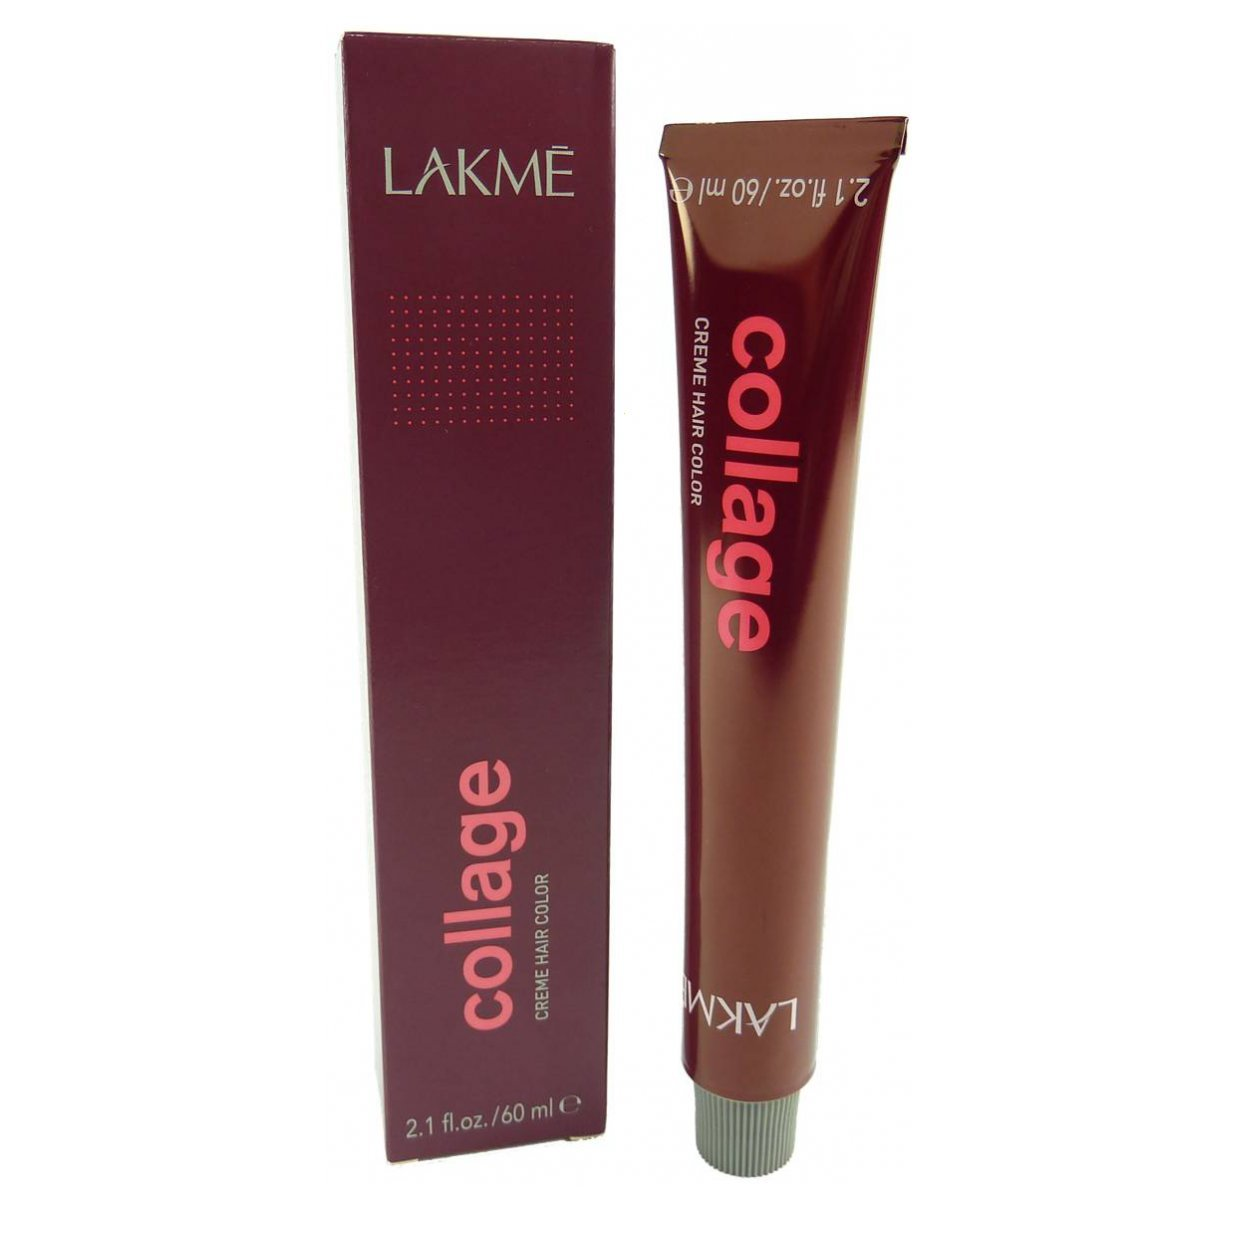 Lakme Collage Creme Hair Color 2.1 Oz - 5/00 Light Brown by Lakme